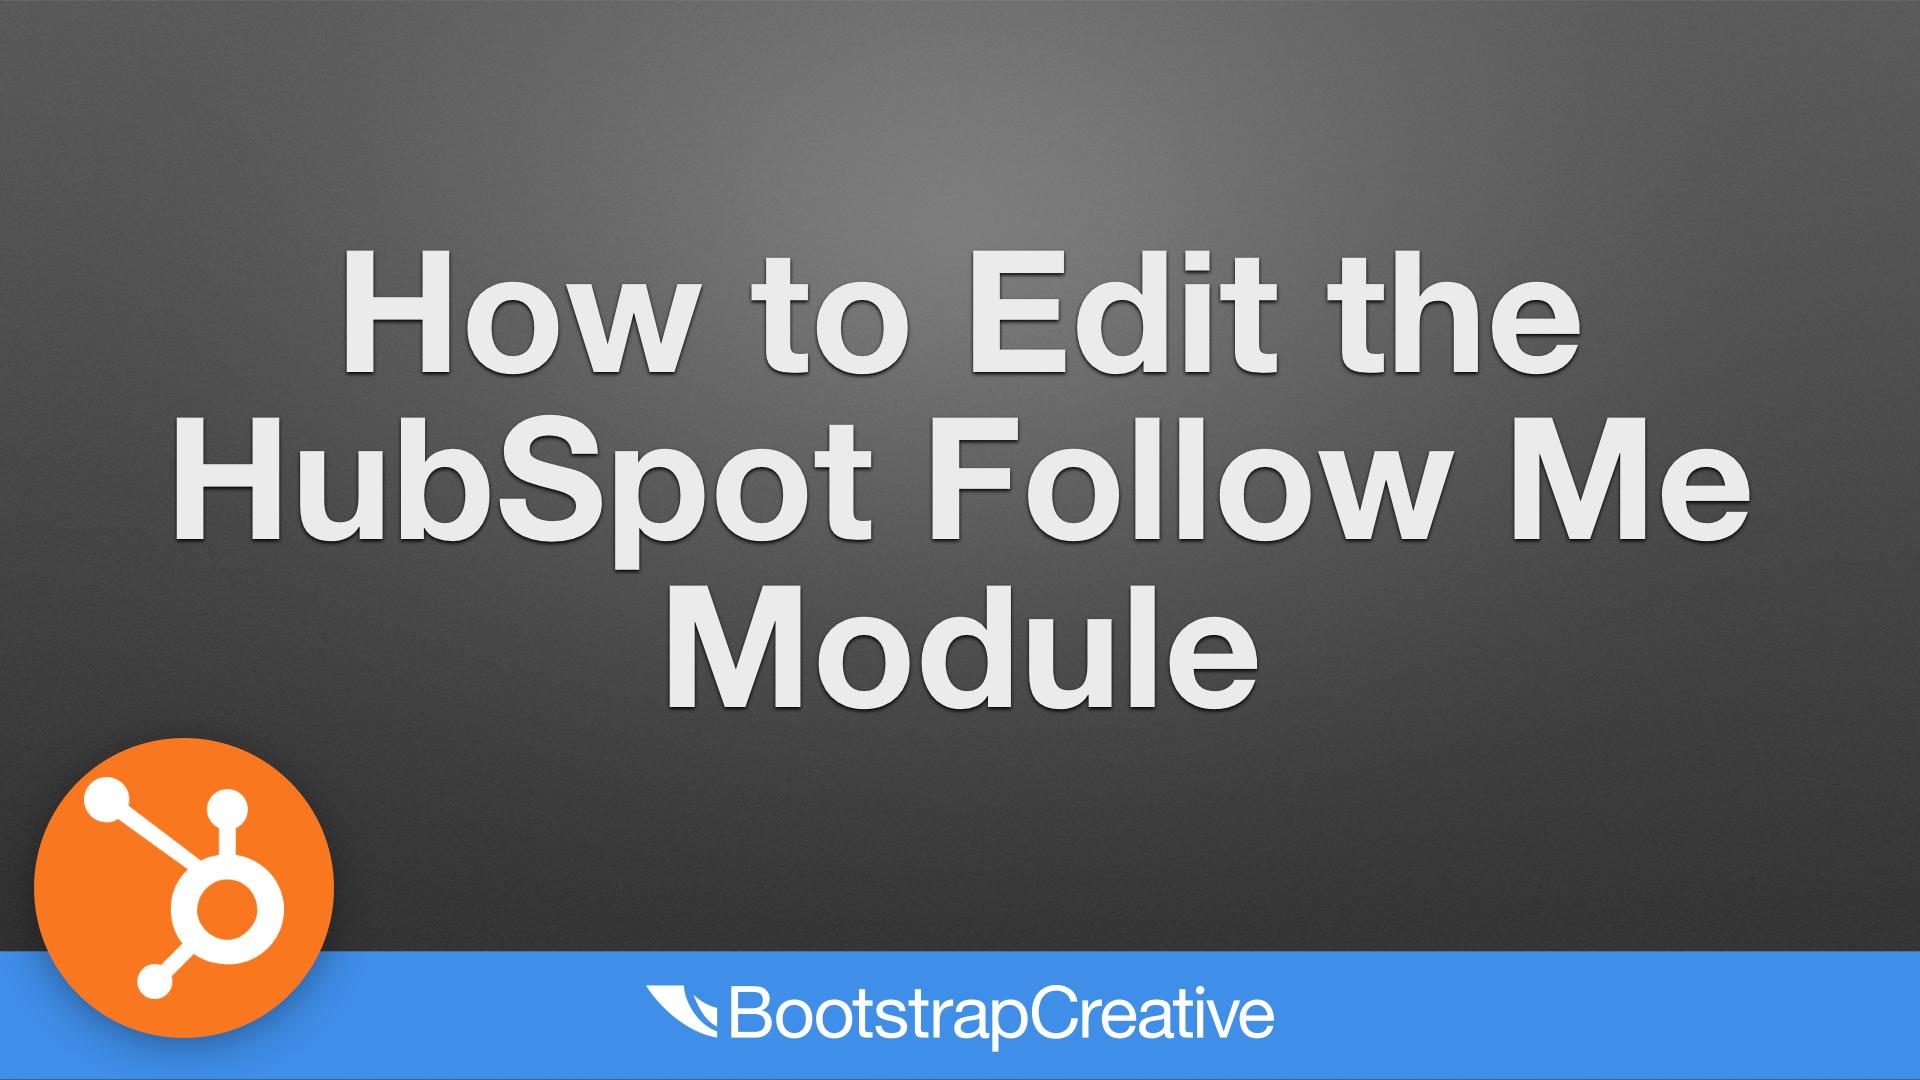 how to edit the HubSpot follow me module